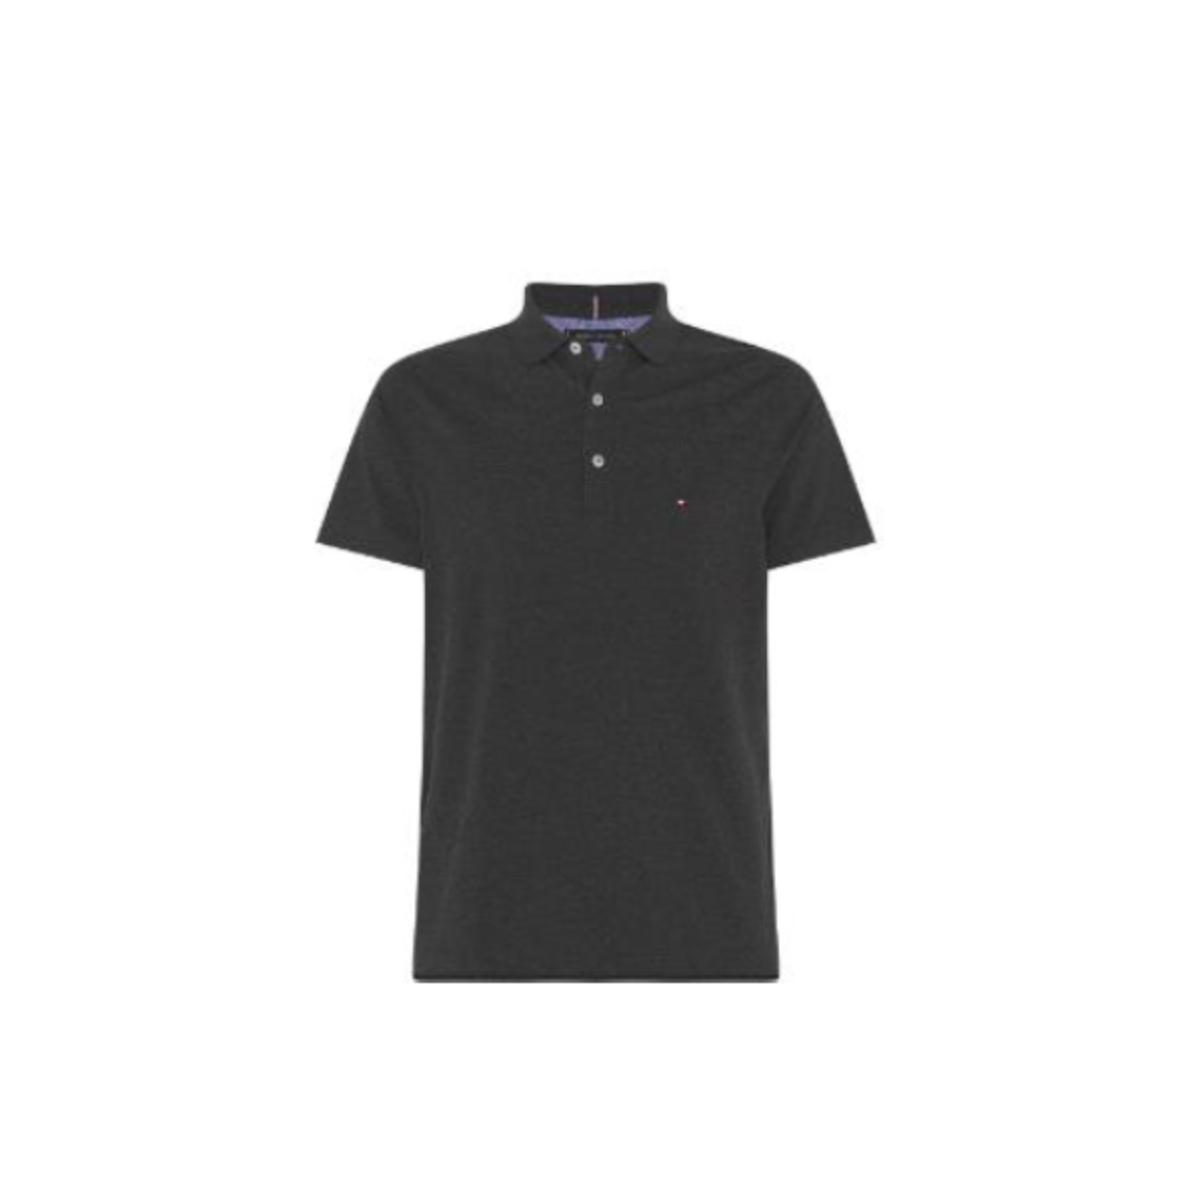 Camiseta Masculina Tommy Thmw0mw10765 Thpgz Cinza